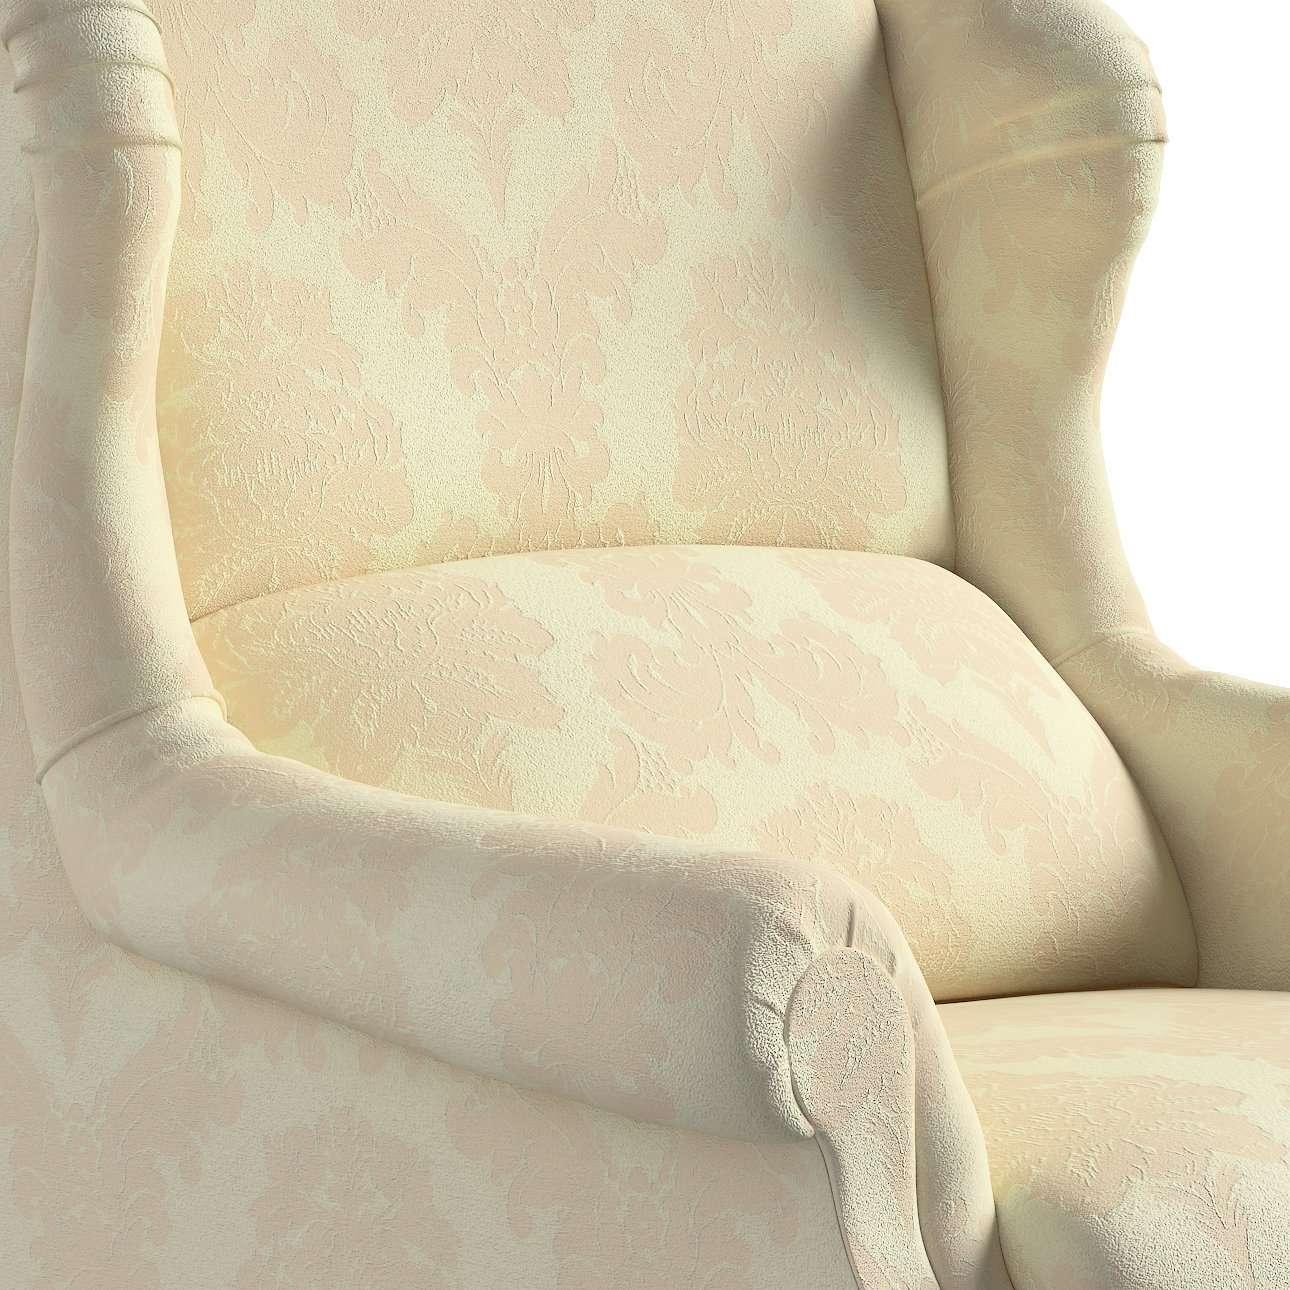 Fotel Unique w kolekcji Damasco, tkanina: 613-01